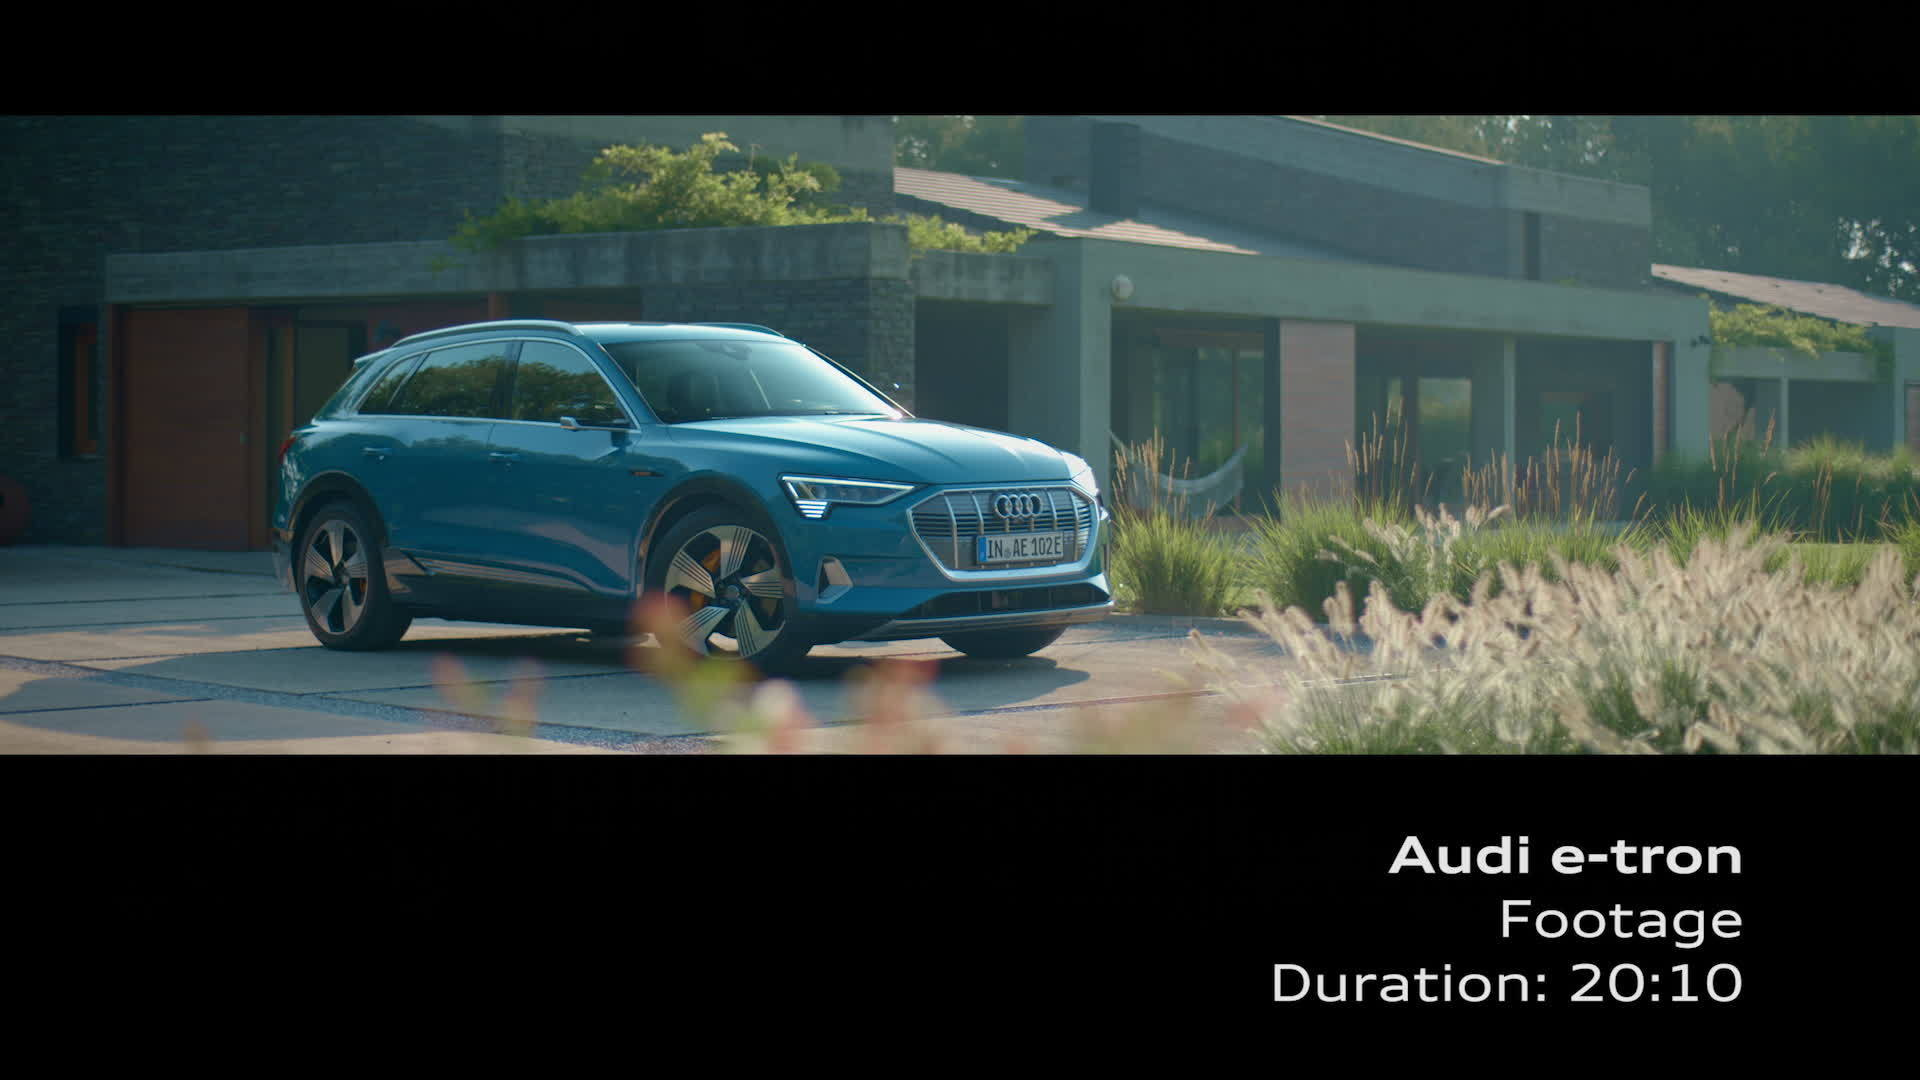 Audi e-tron (Footage)